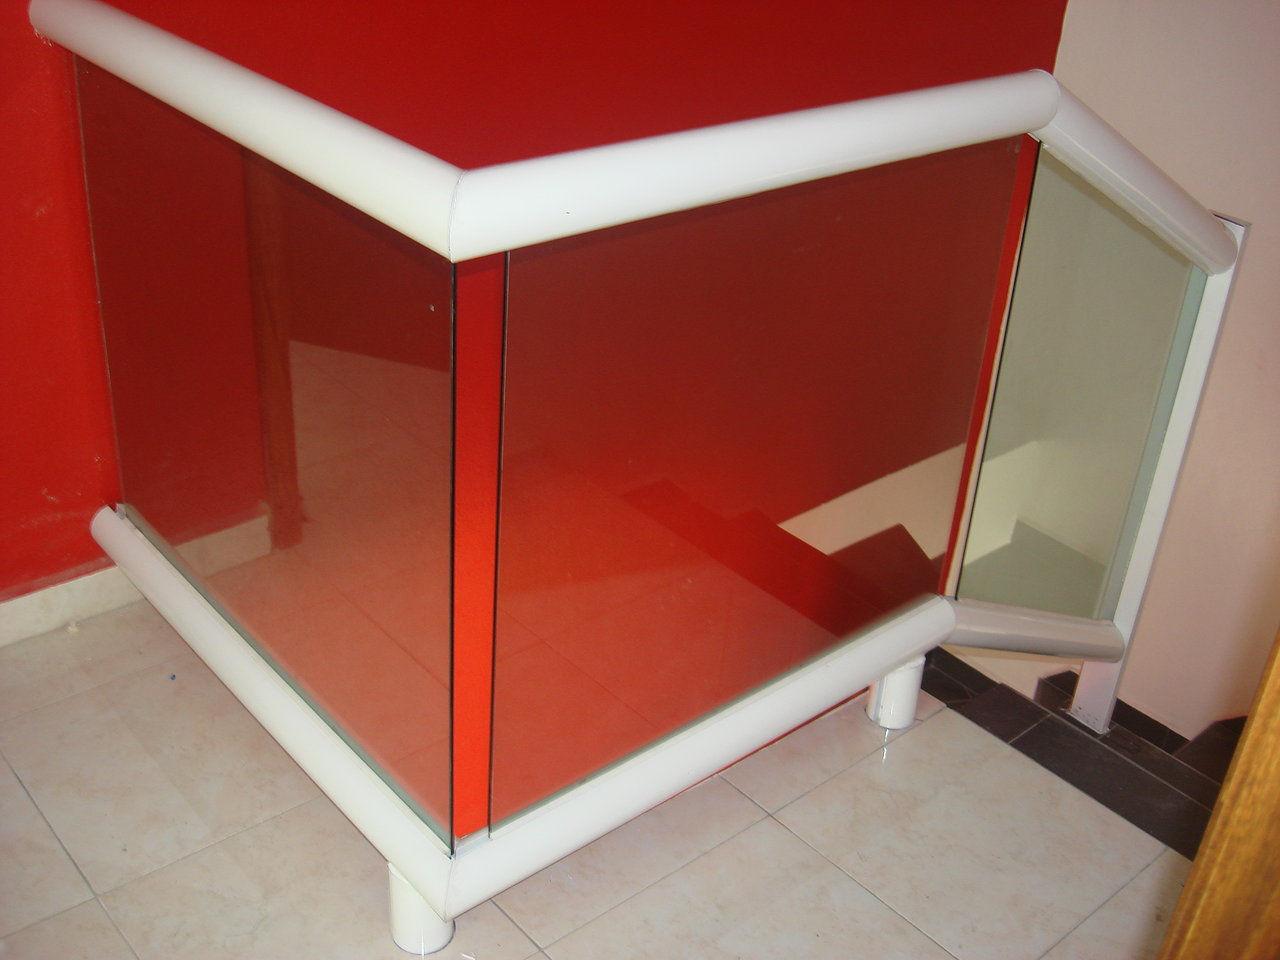 Servalum servicio en aluminio for Barandales de aluminio blanco